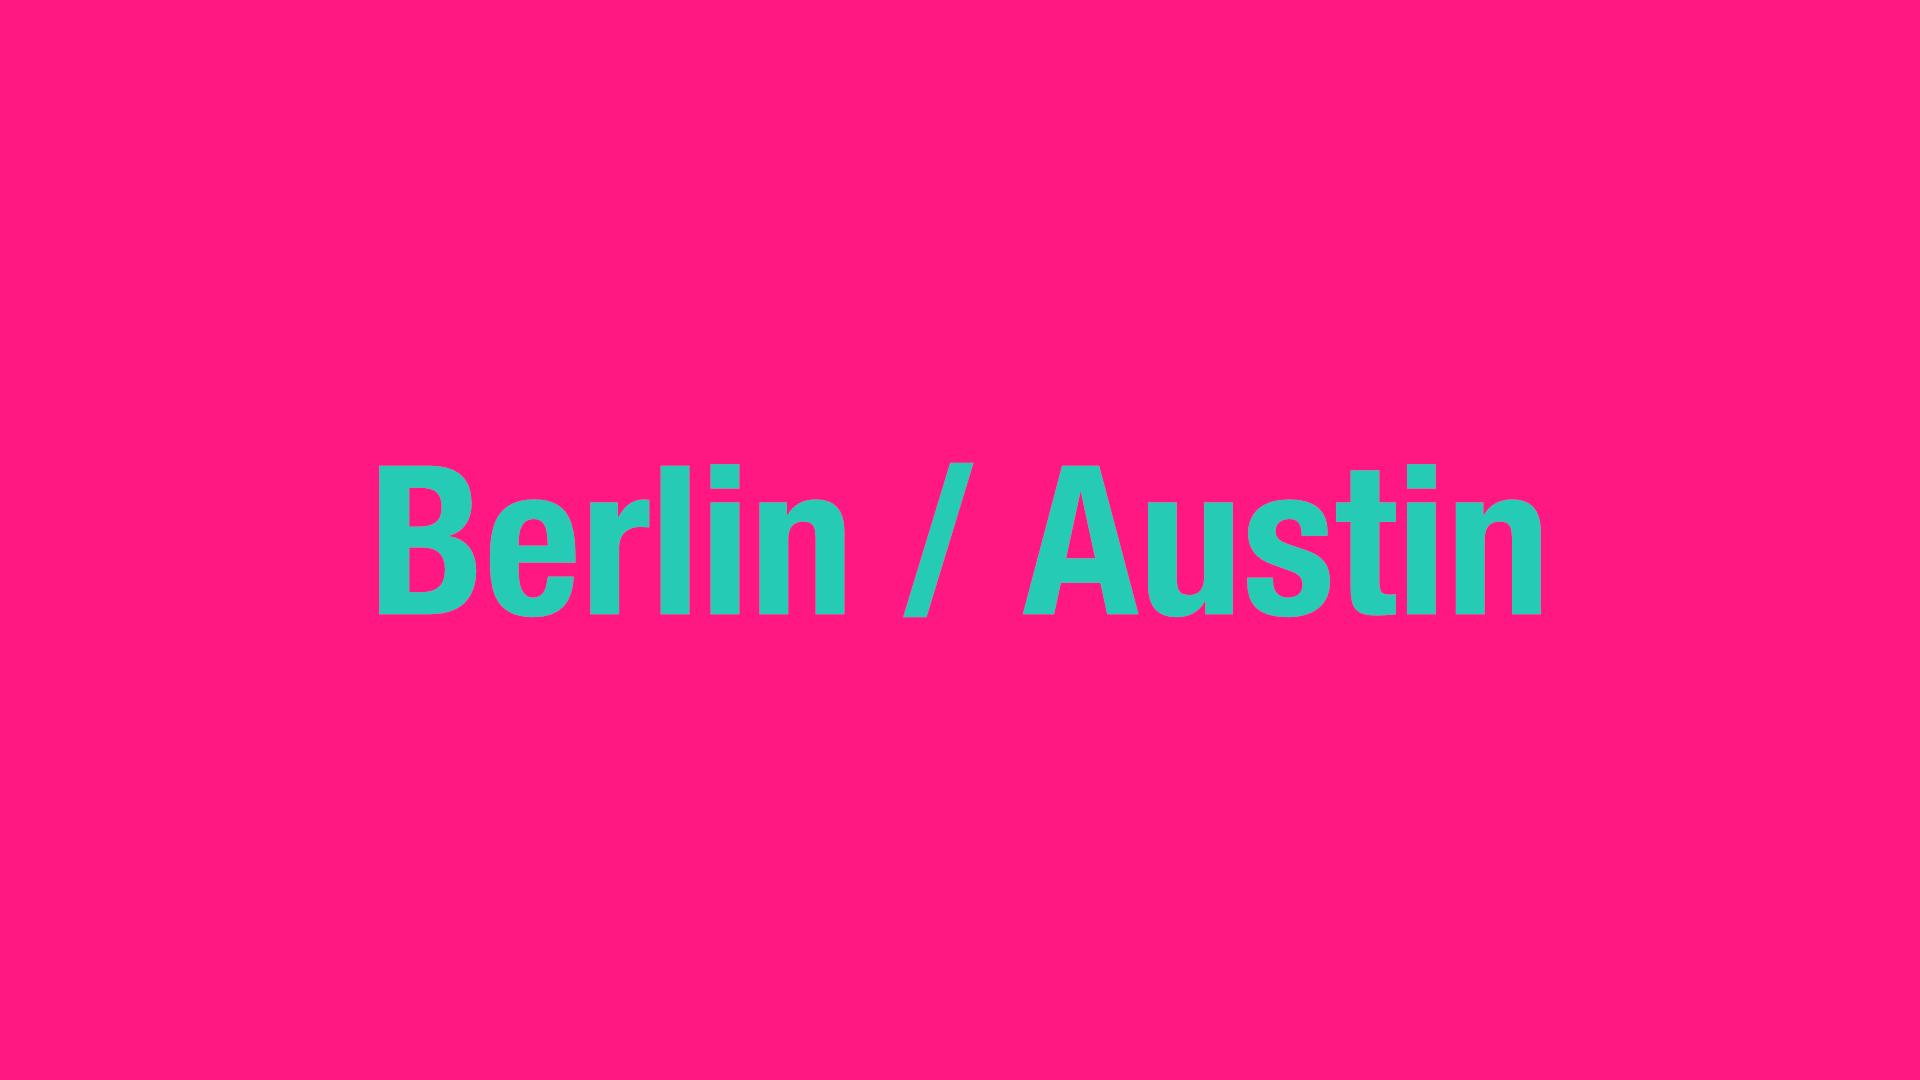 Berlin / Austin